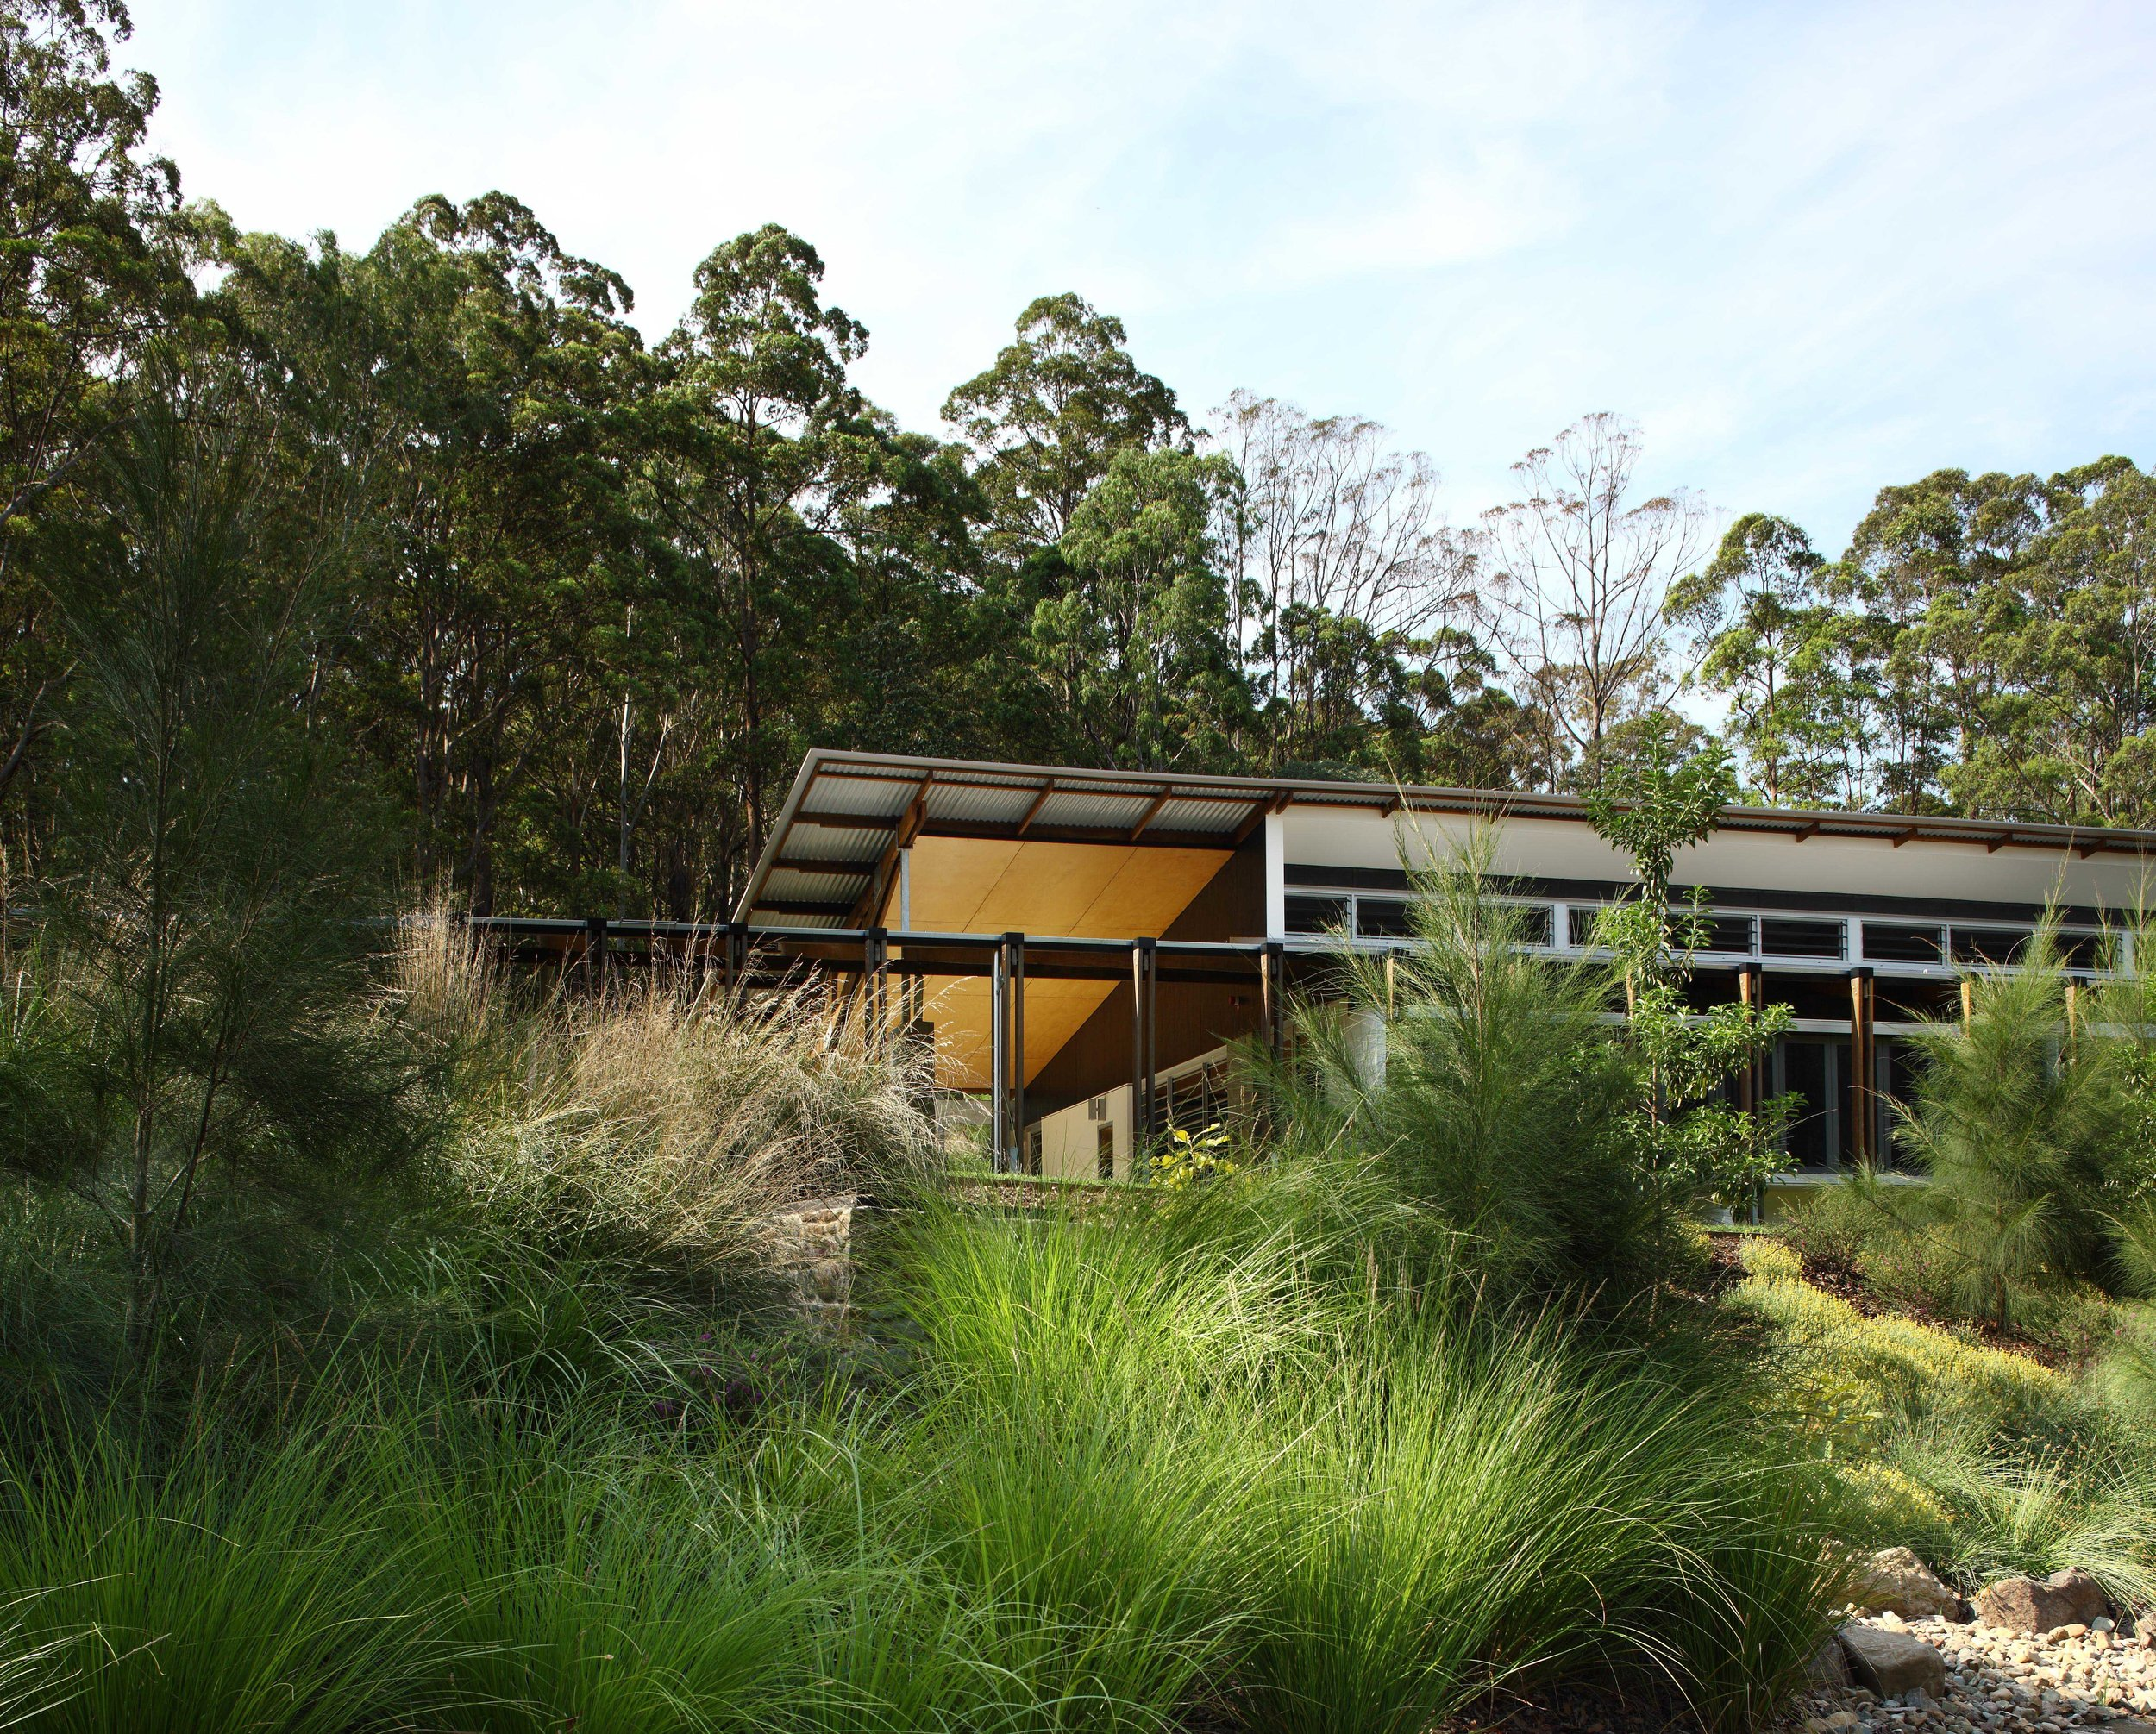 Maroochy-Botanic-Gardens-Guymer-Bailey-Architects-01.jpg